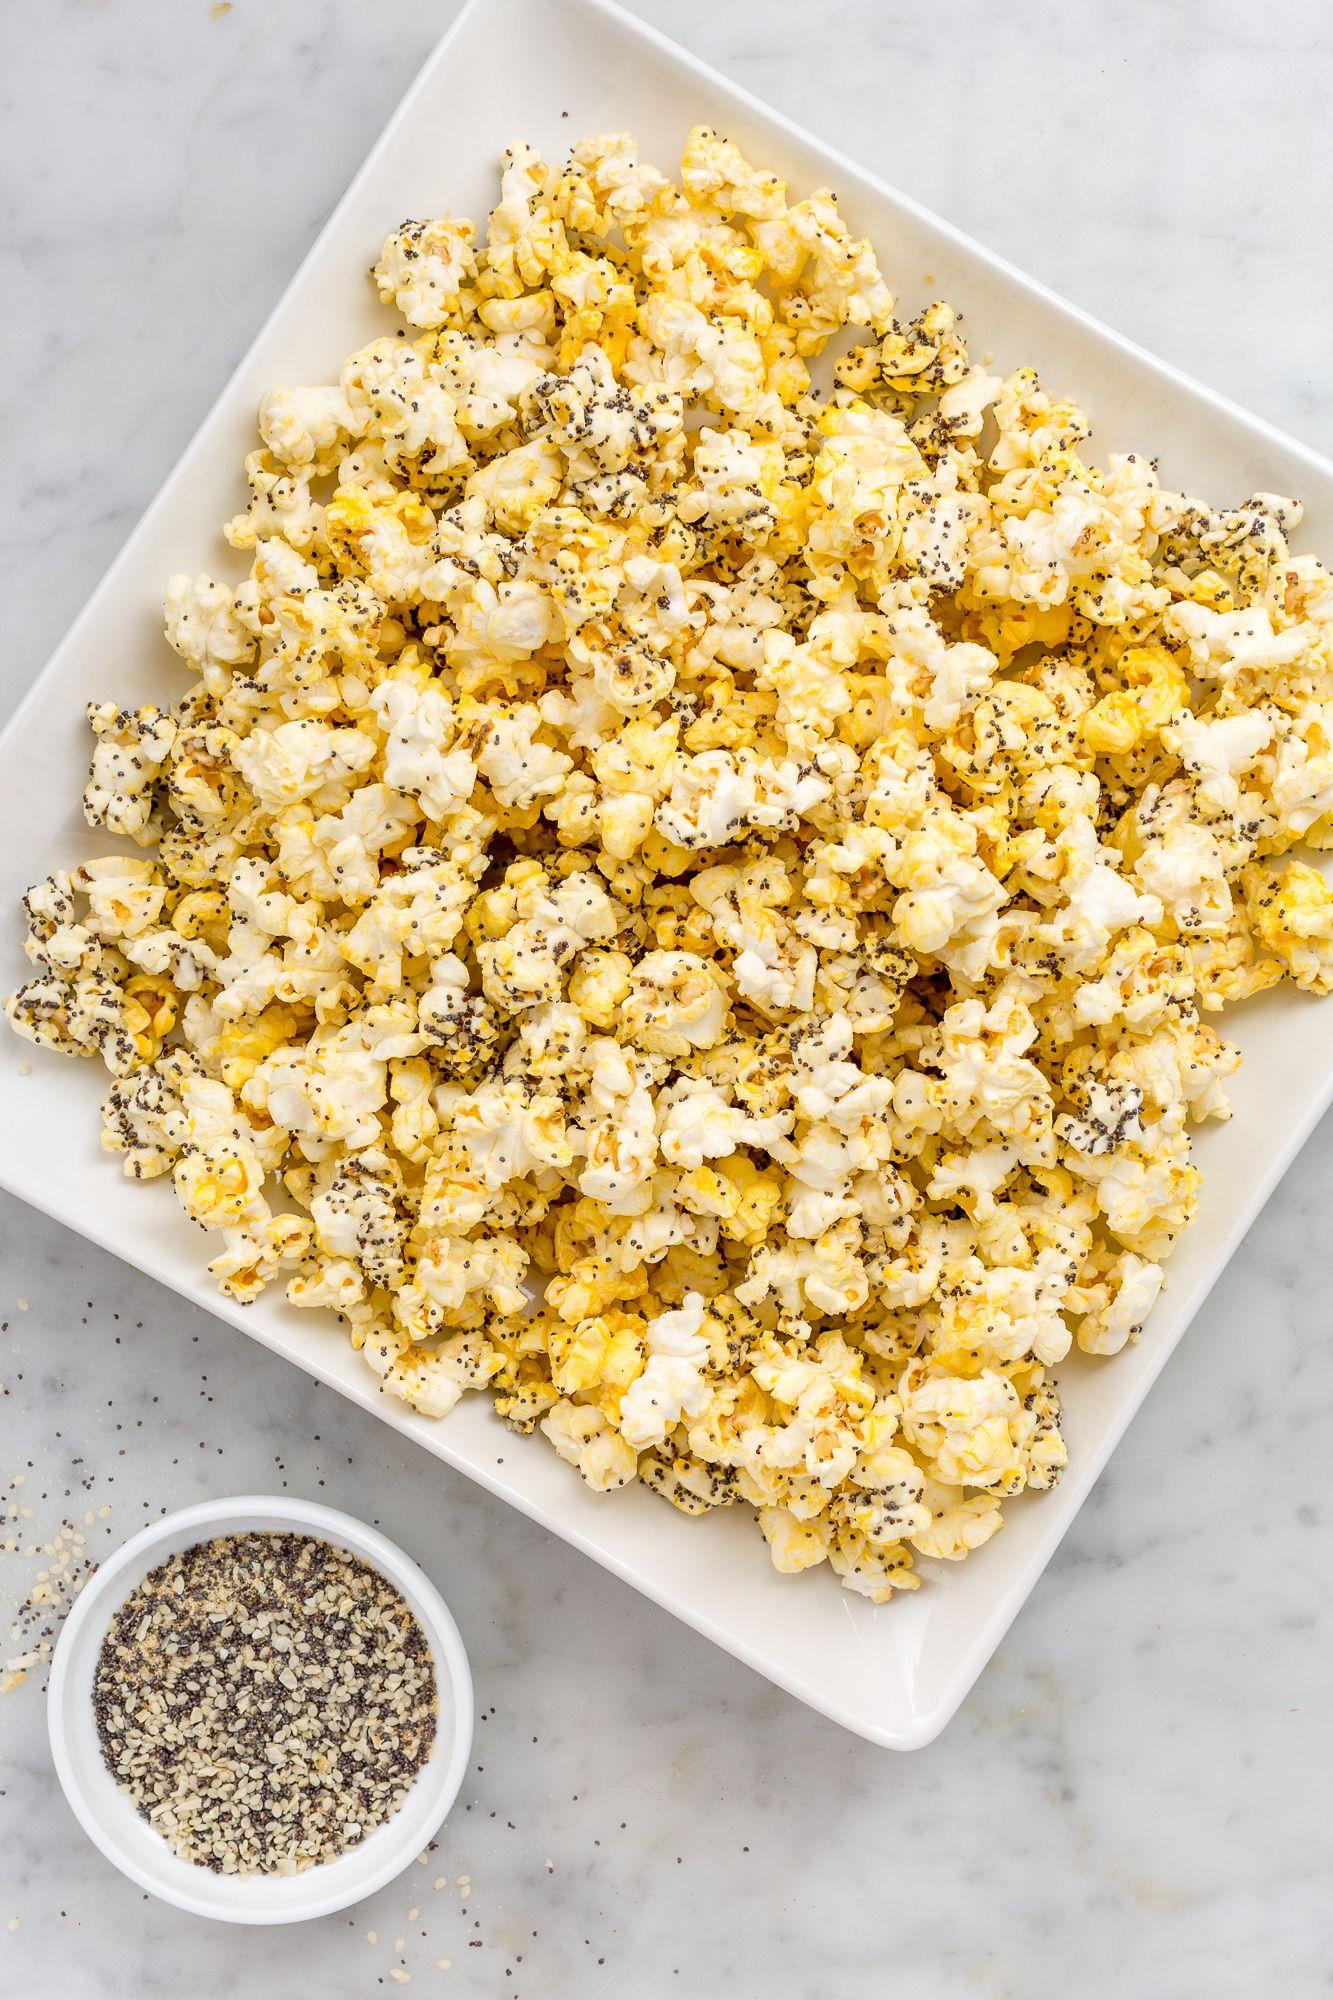 photo 7 Popcorn Hacks That Will Seriously Upgrade Movie Night